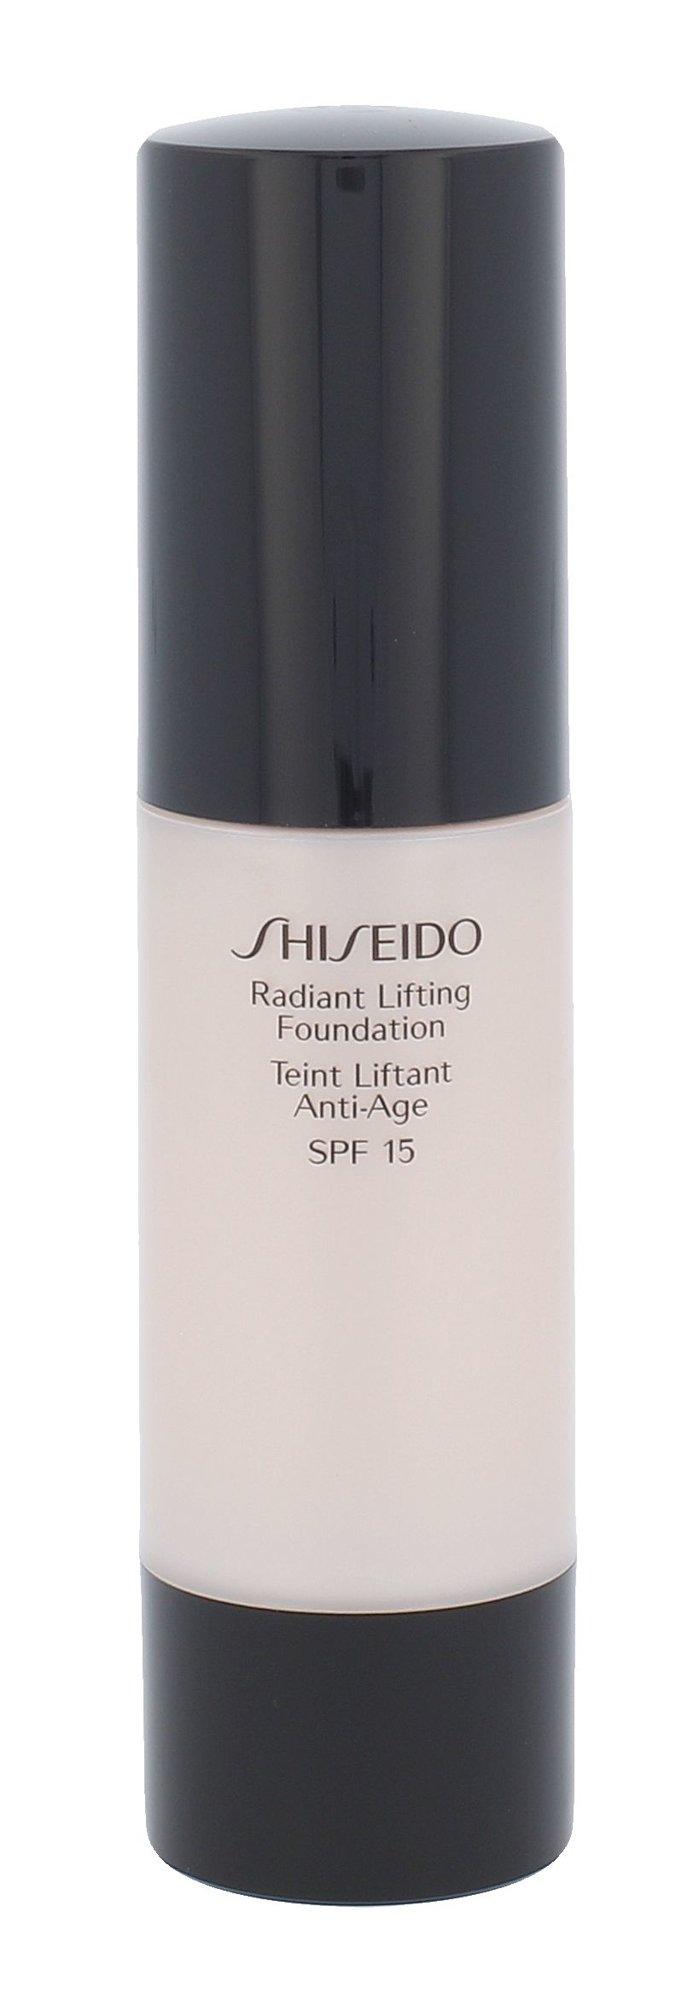 Shiseido Radiant Lifting Foundation Cosmetic 30ml O20 Natural Light Ochre